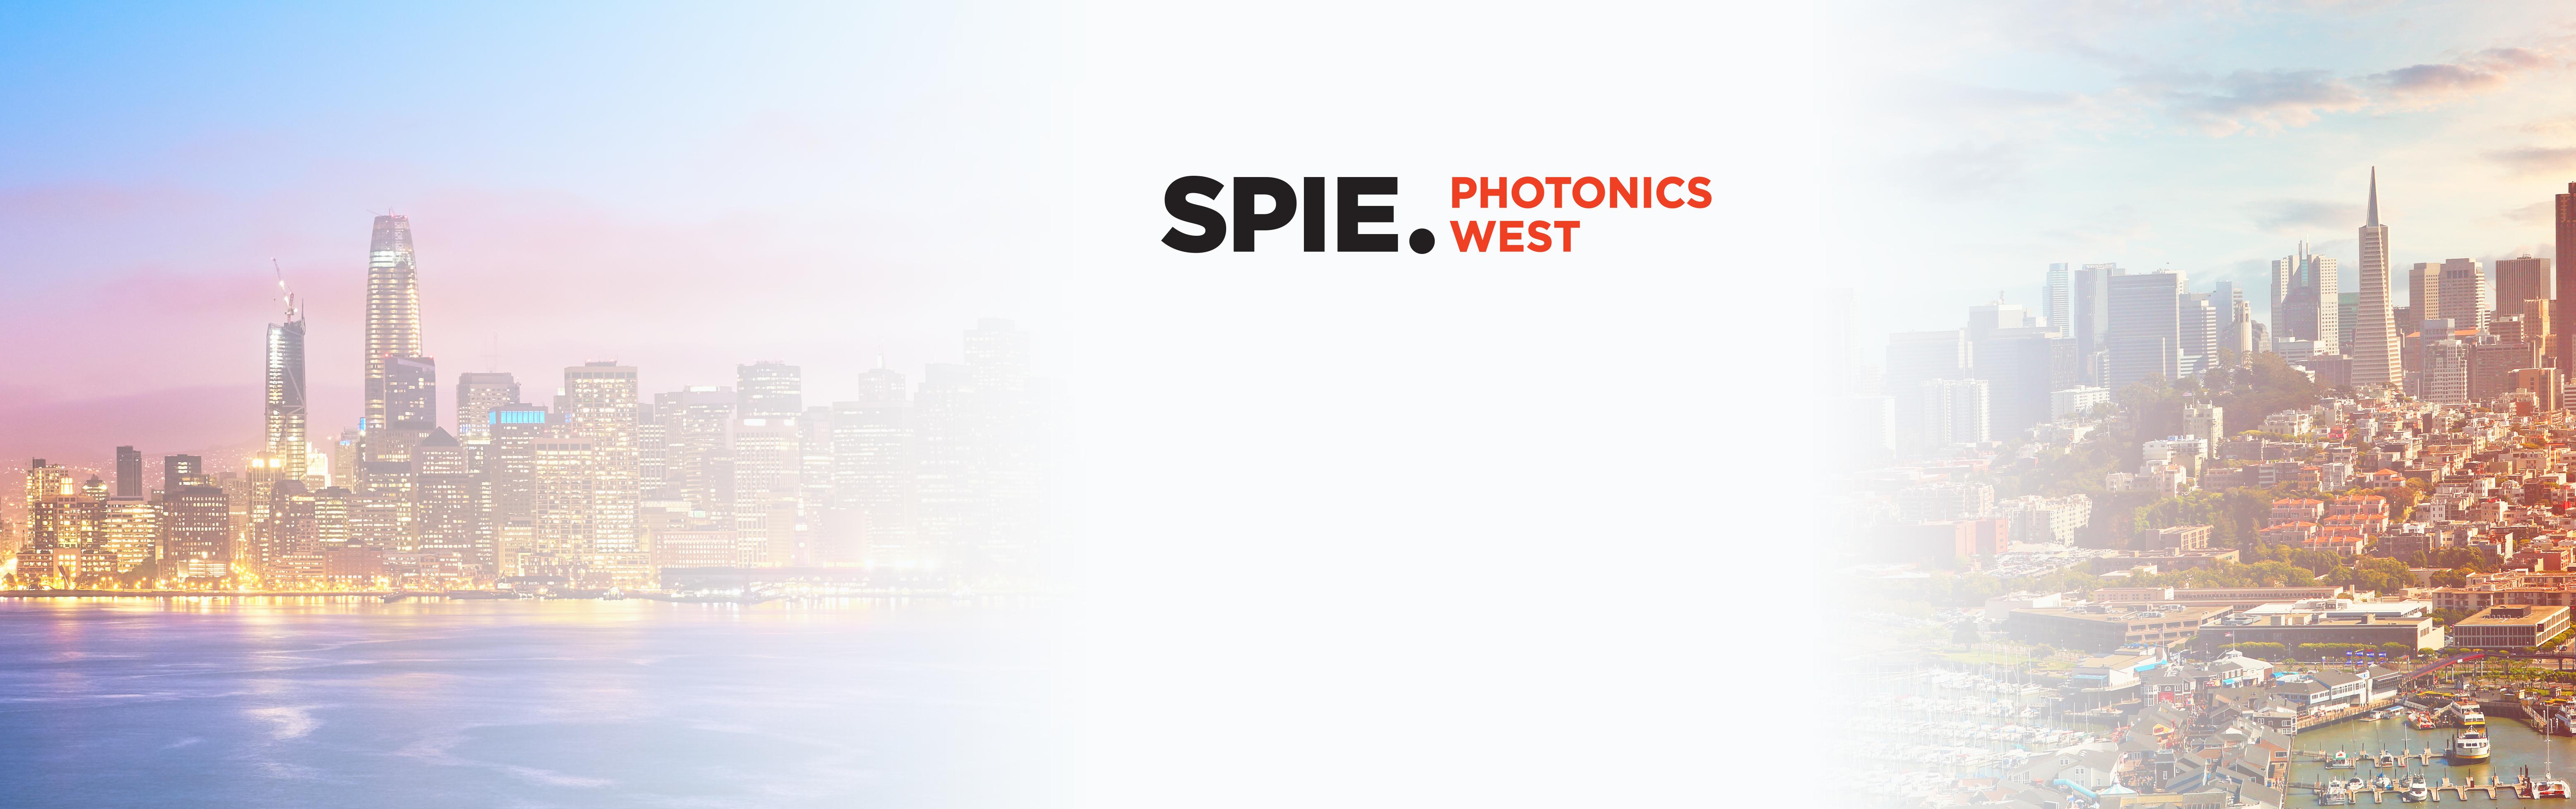 SPIEPW2019SliderGraphic_PSD_v3.png